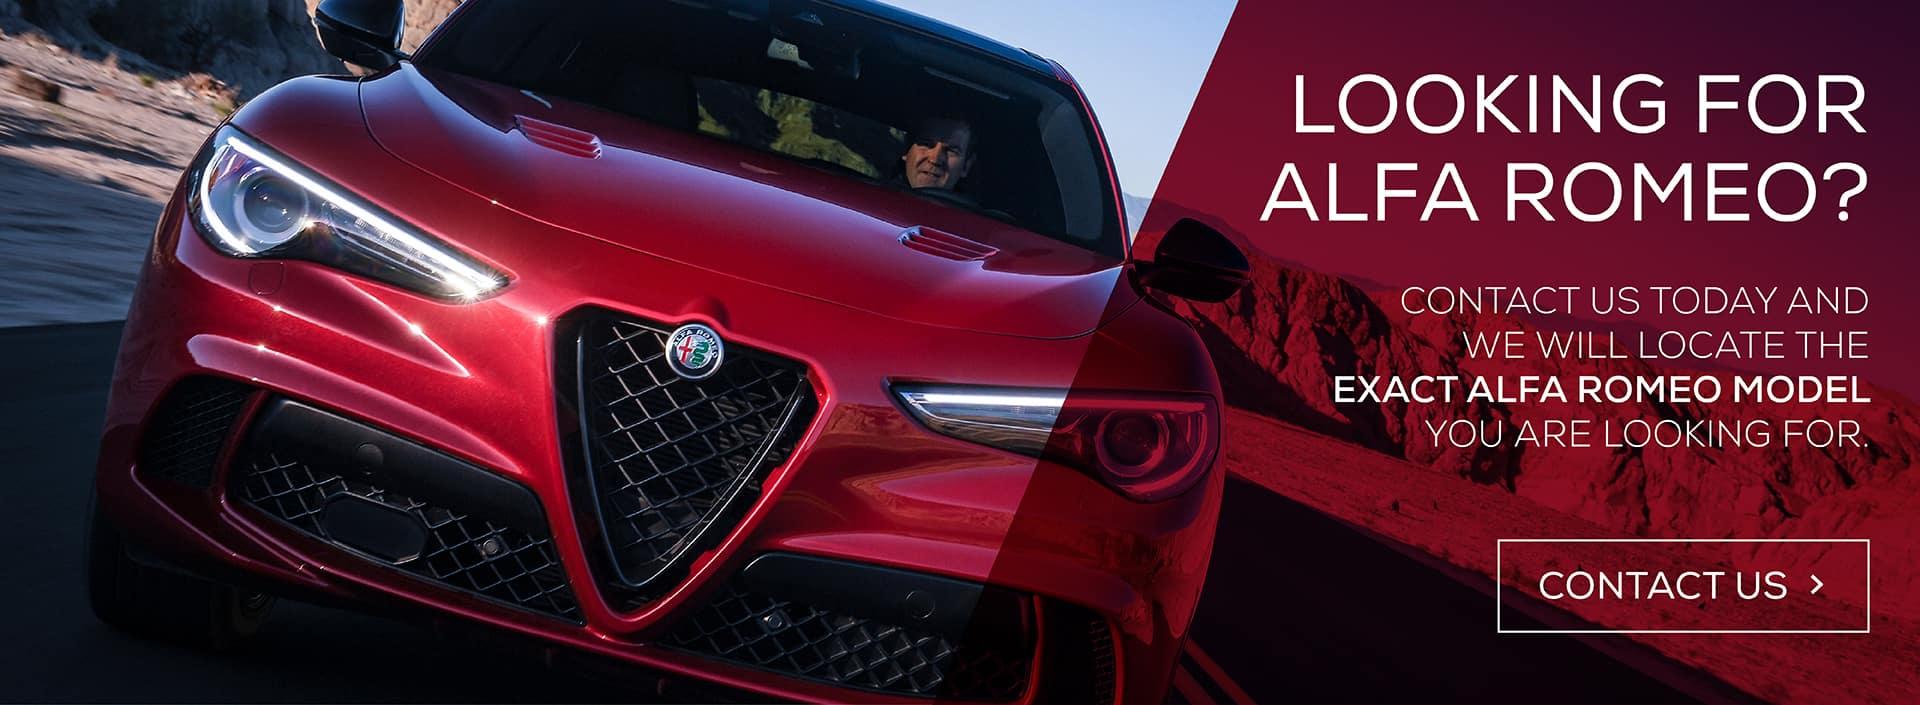 1374039-LFFM-Alfa Romeo OCT WB-1920×705